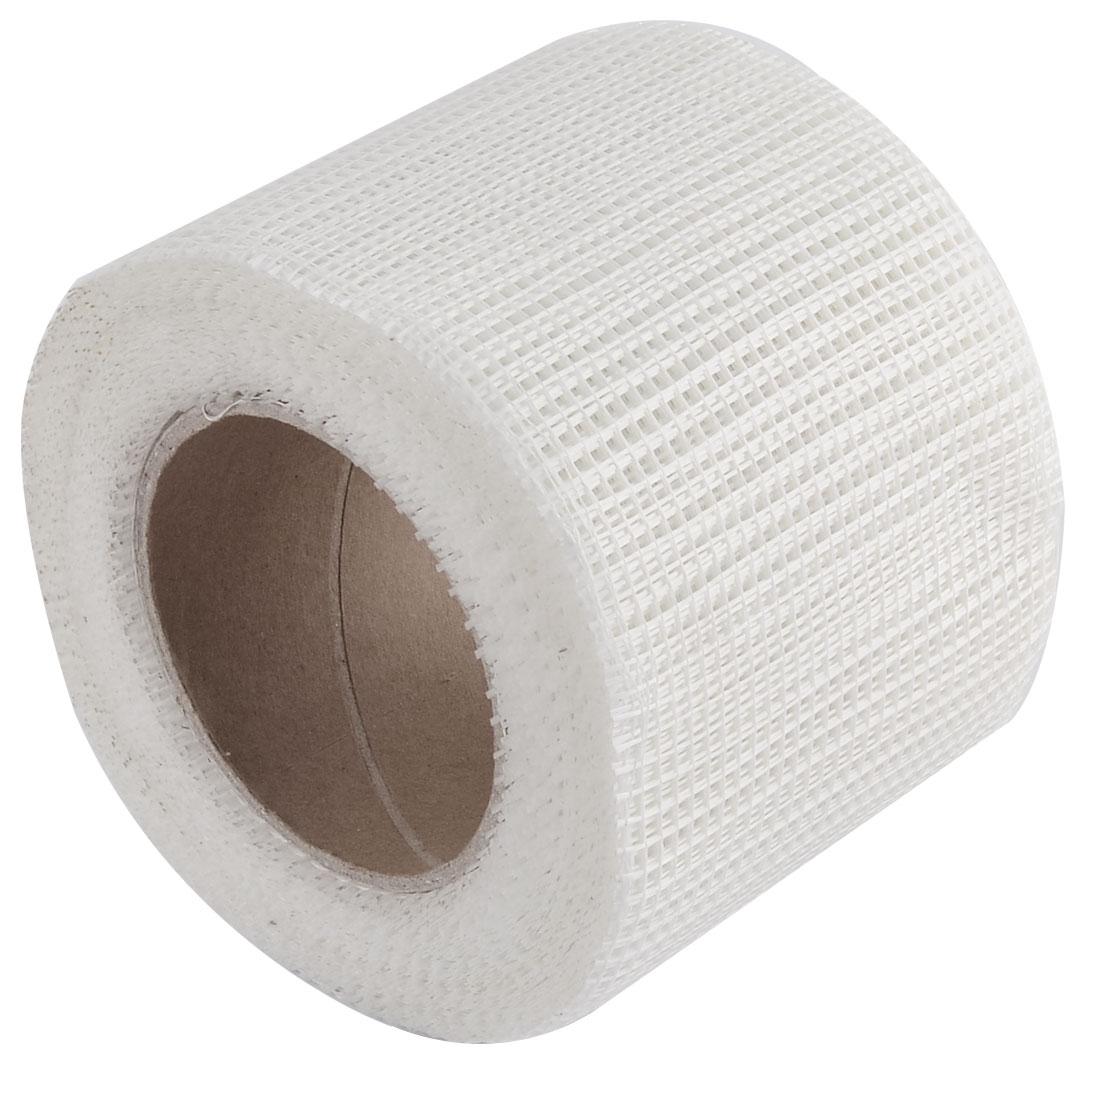 Sheetrock Drywall Self Adhesive Mesh Wall Repair Fabric Joint Tape Roll